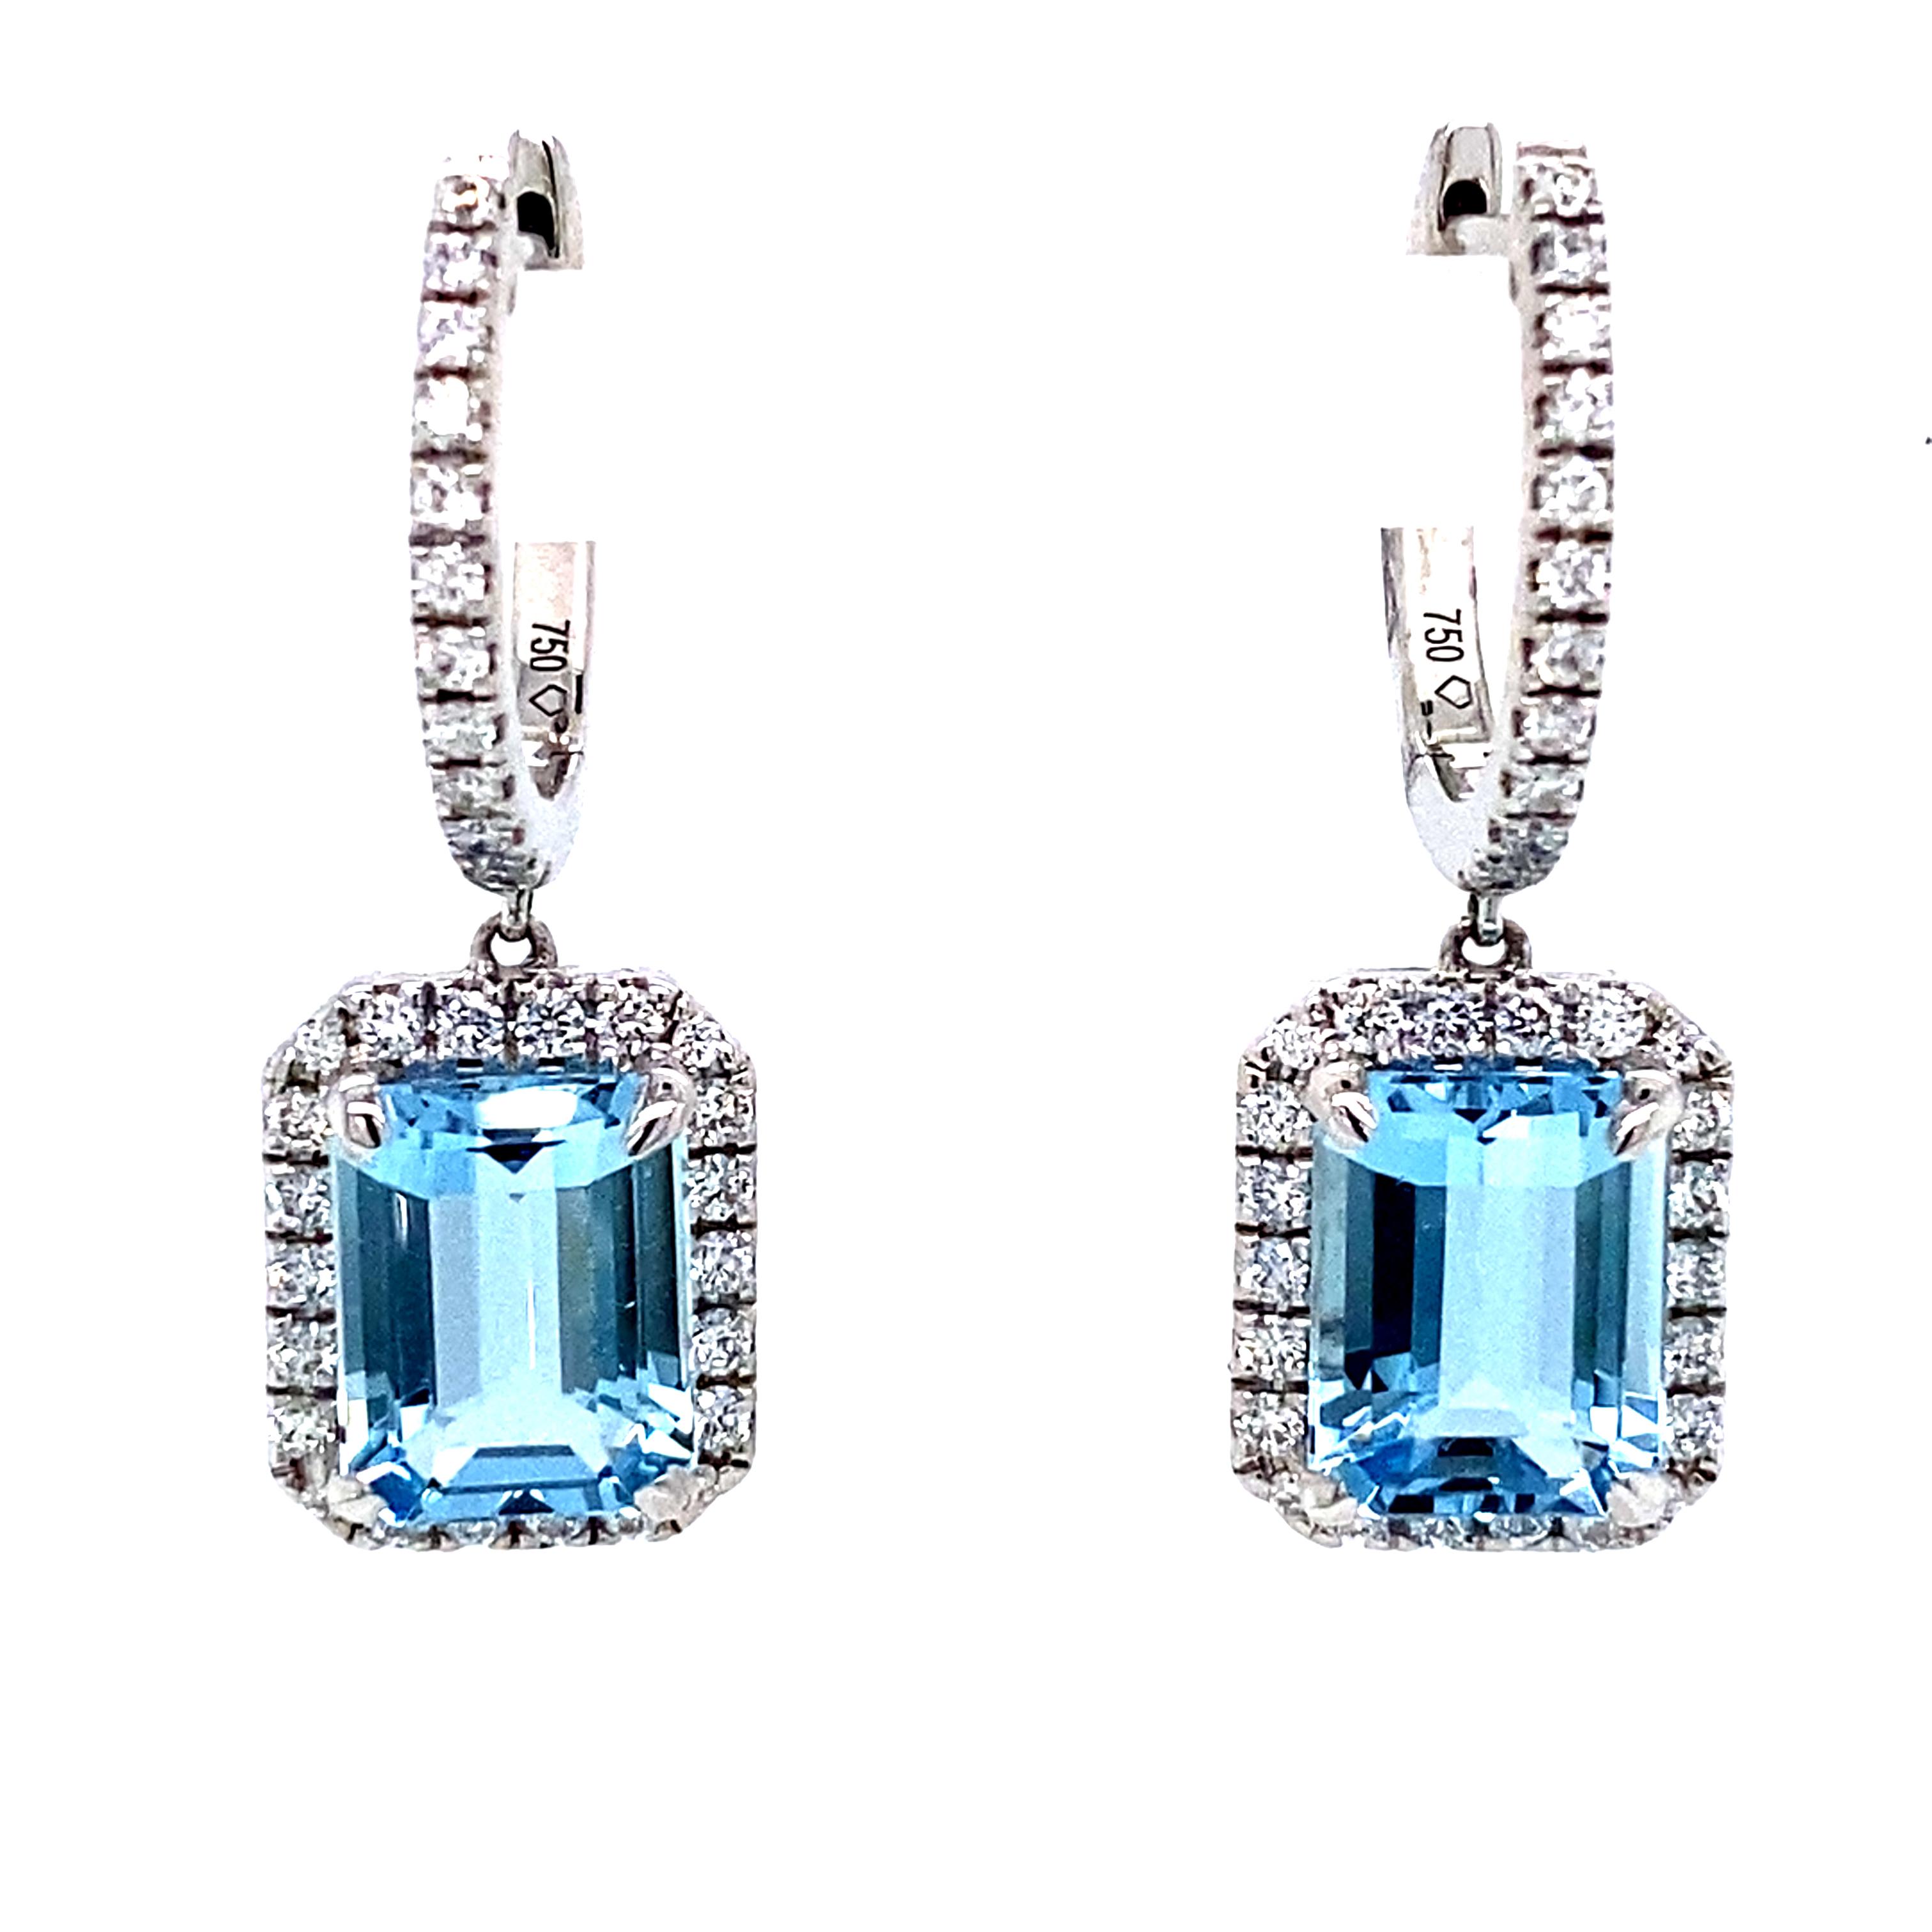 1.44 Carat Aquamarine and Diamond Dangly Drop Earrings